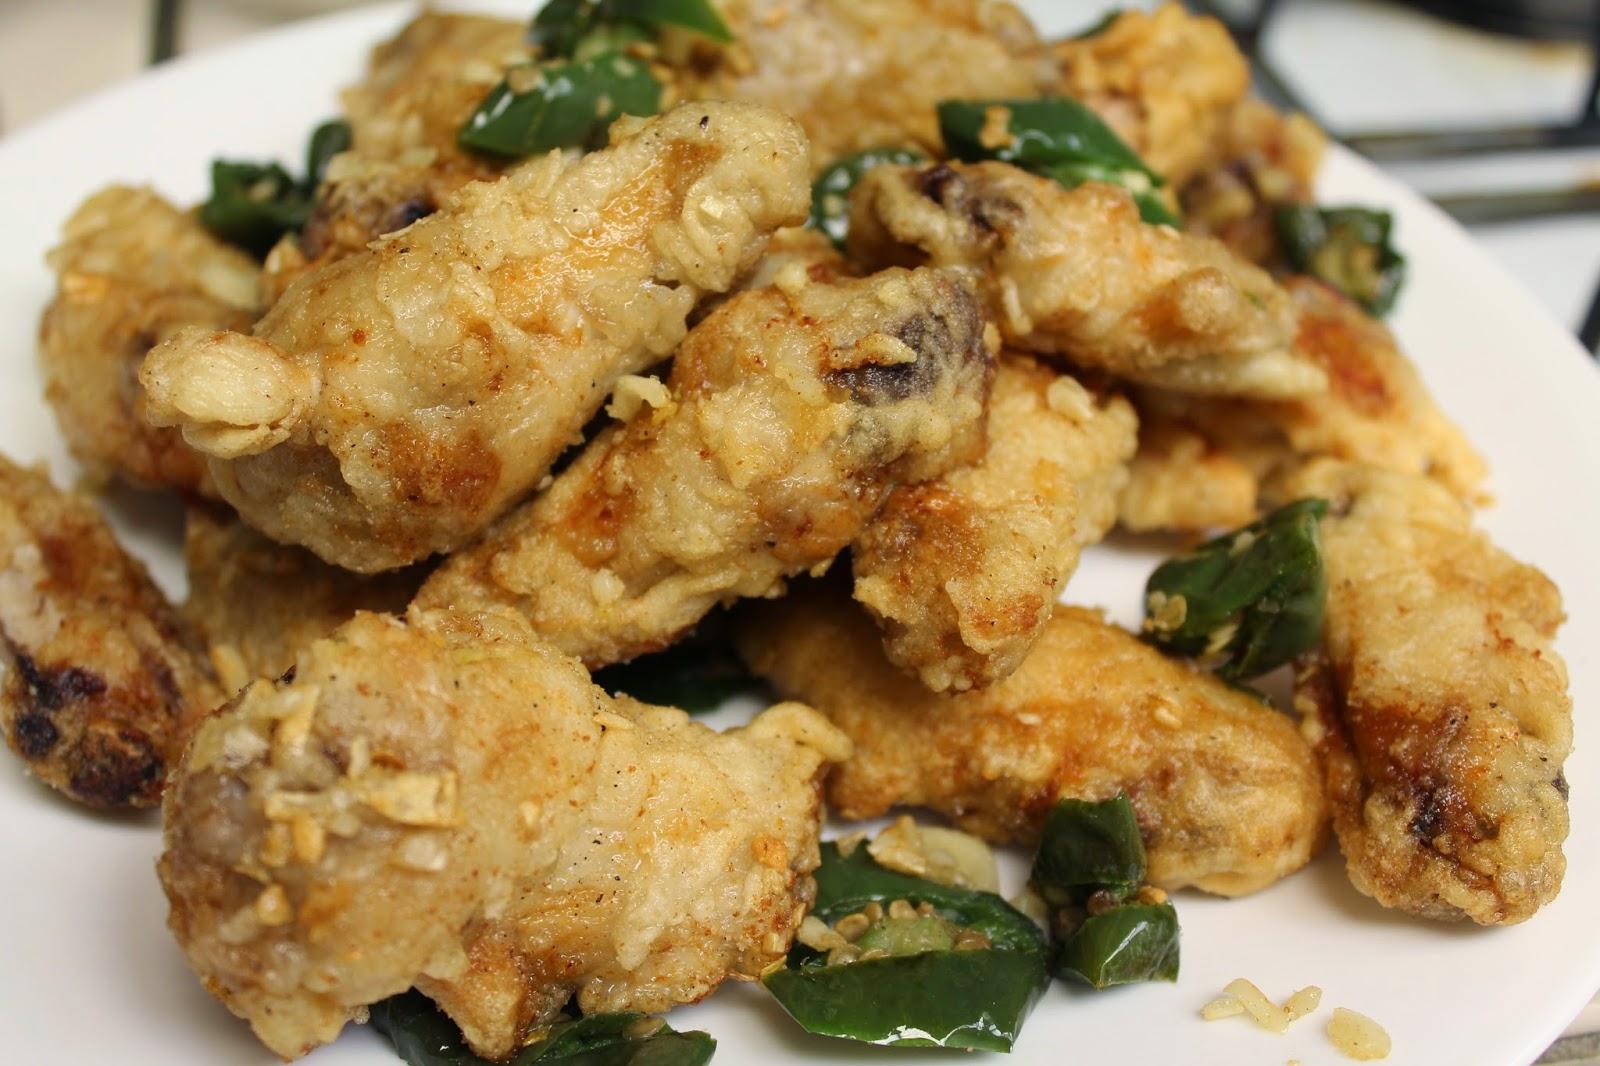 Kathy Nom Nom: Salt and Pepper Chicken Wings